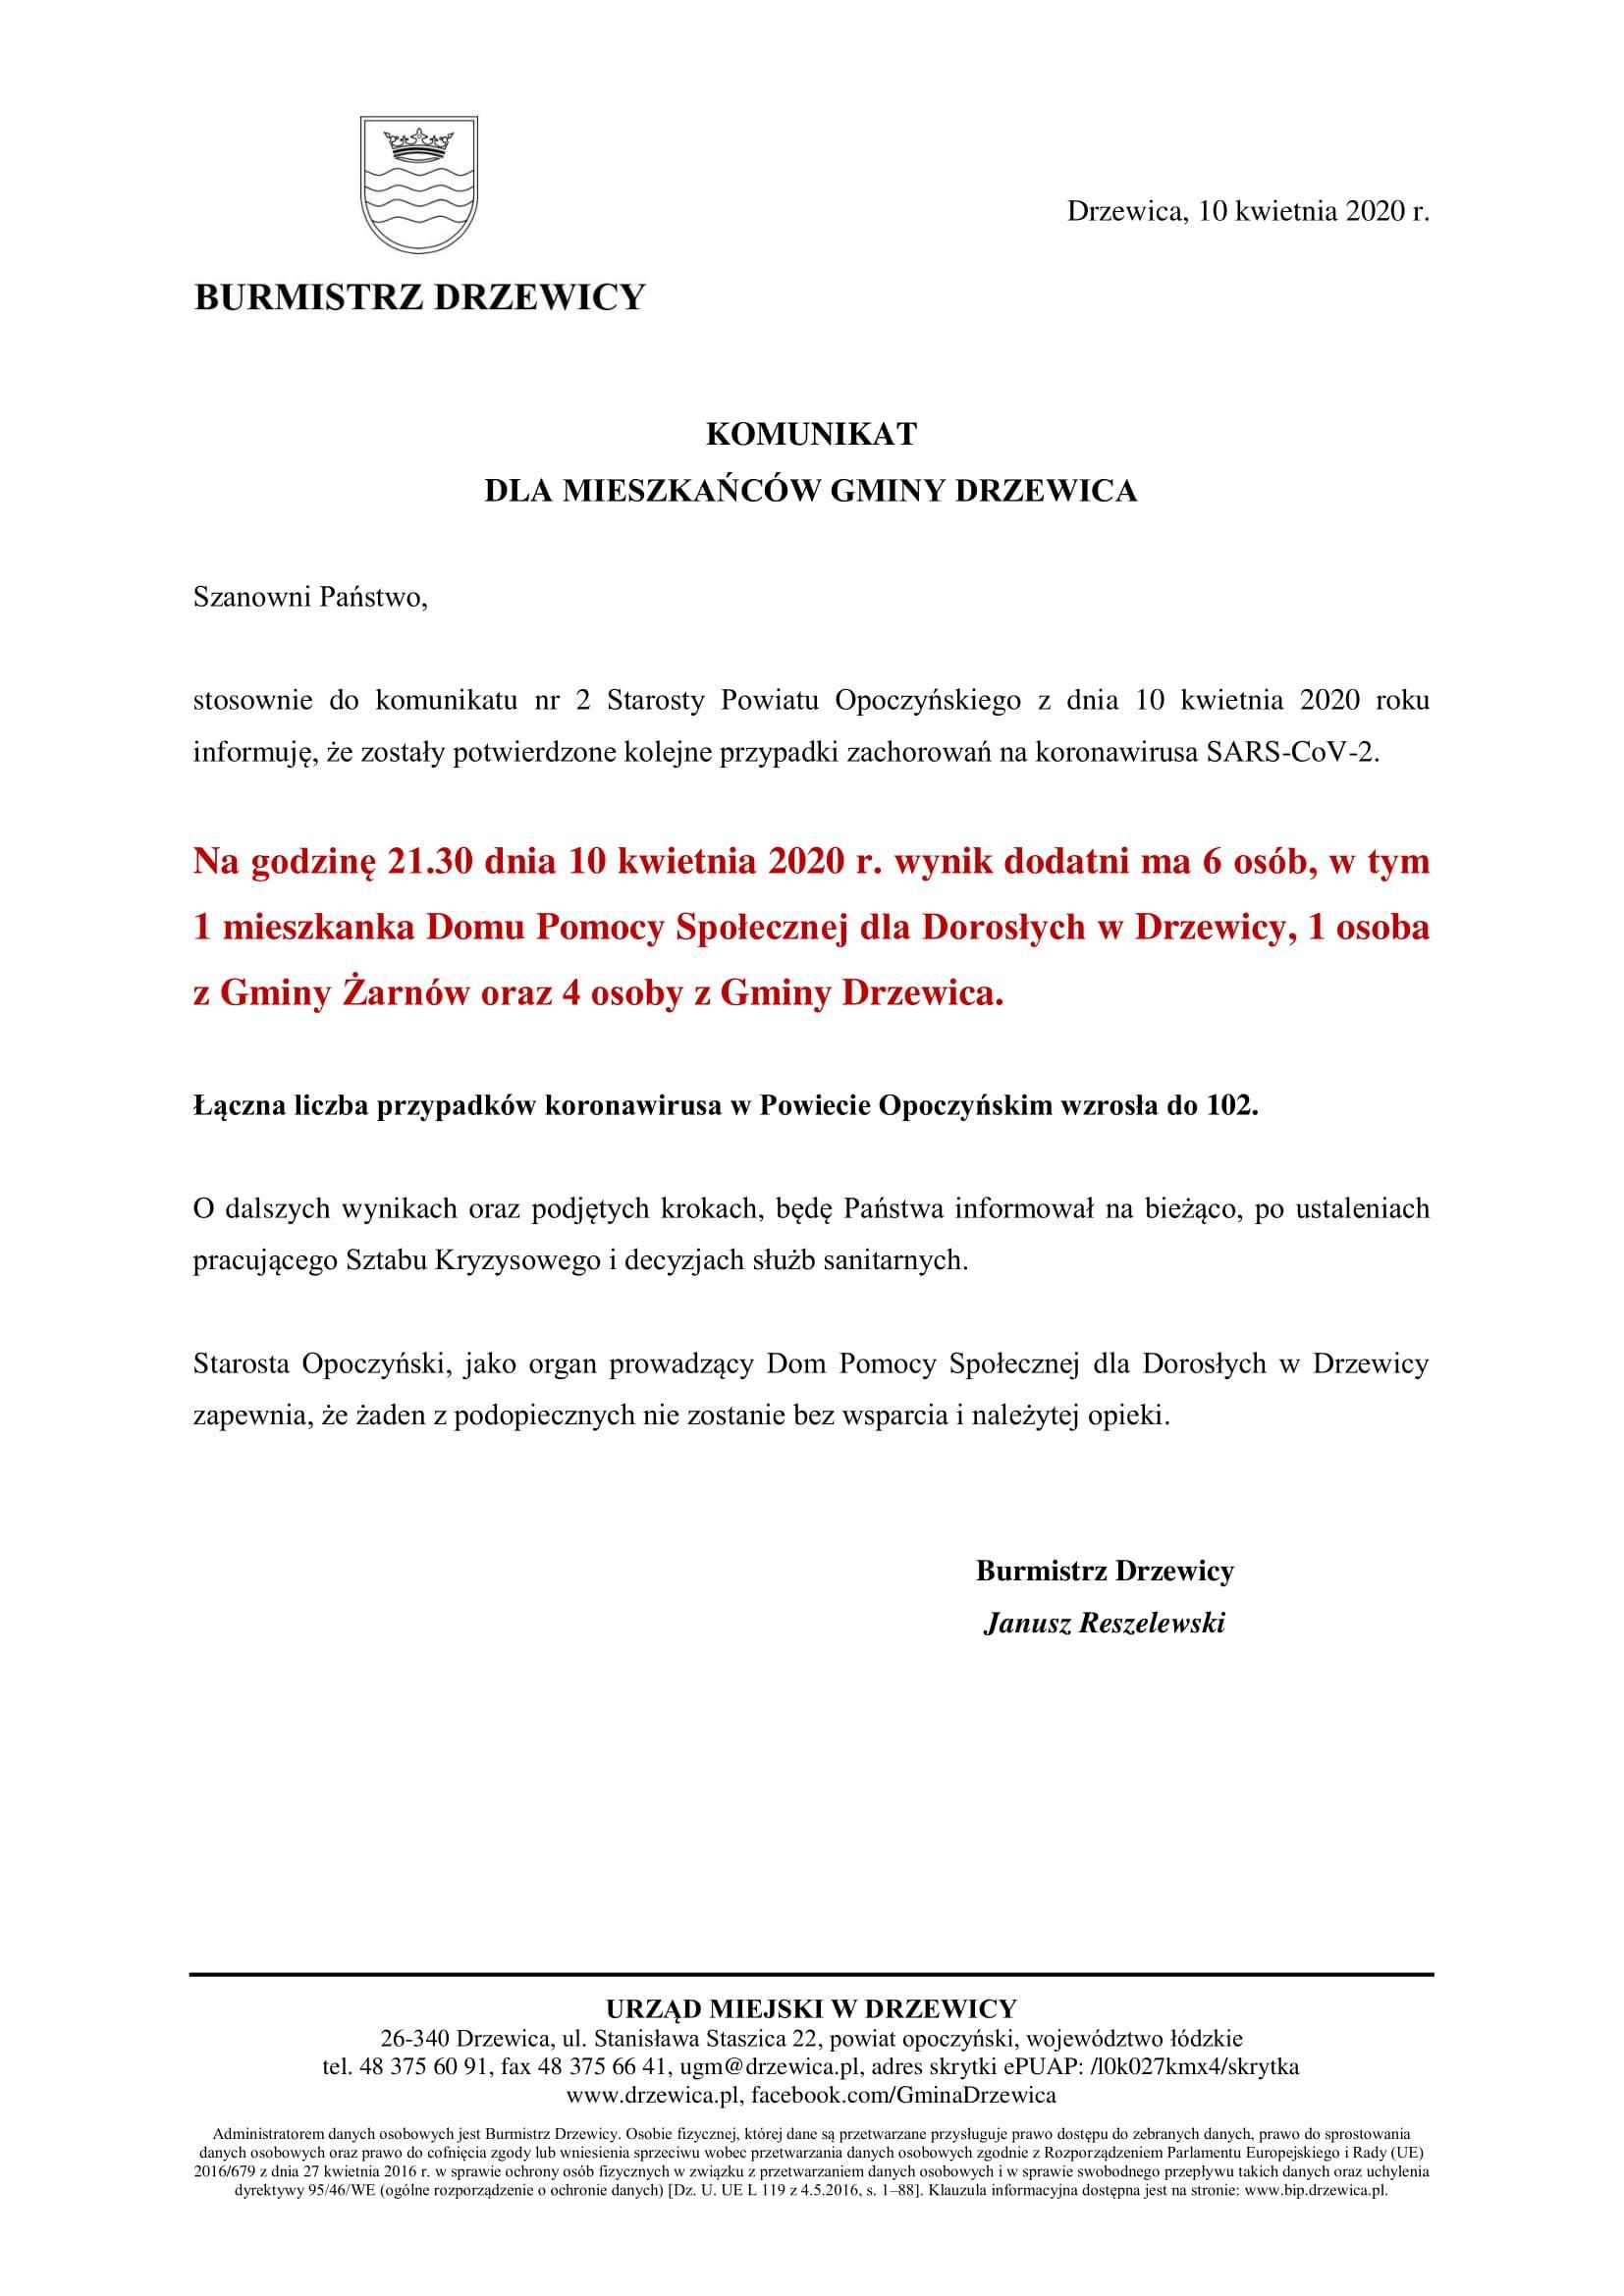 Komunikat Burmistrza Drzewica